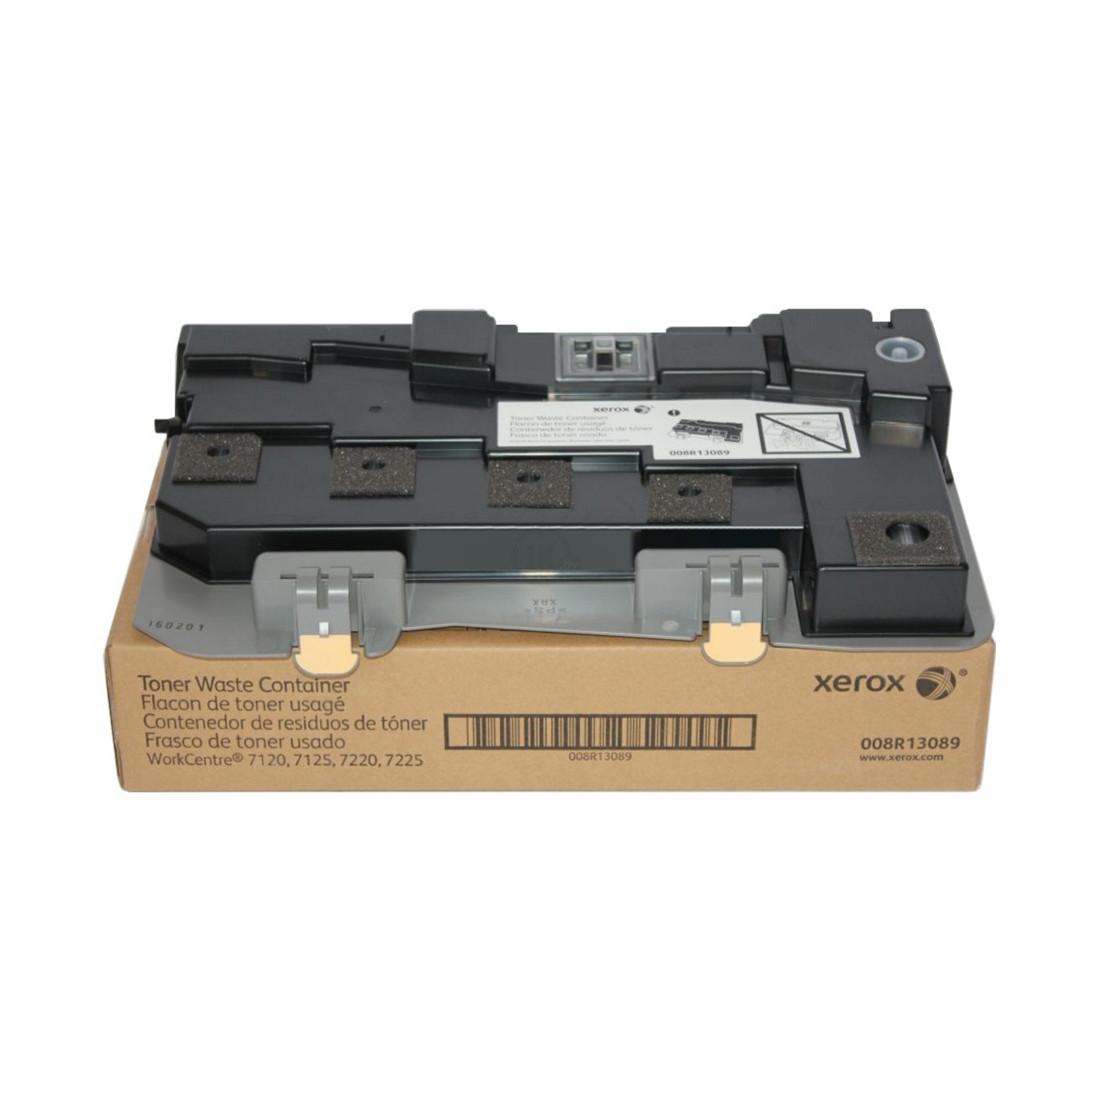 Контейнер для отработанного тонера Xerox 008R13089